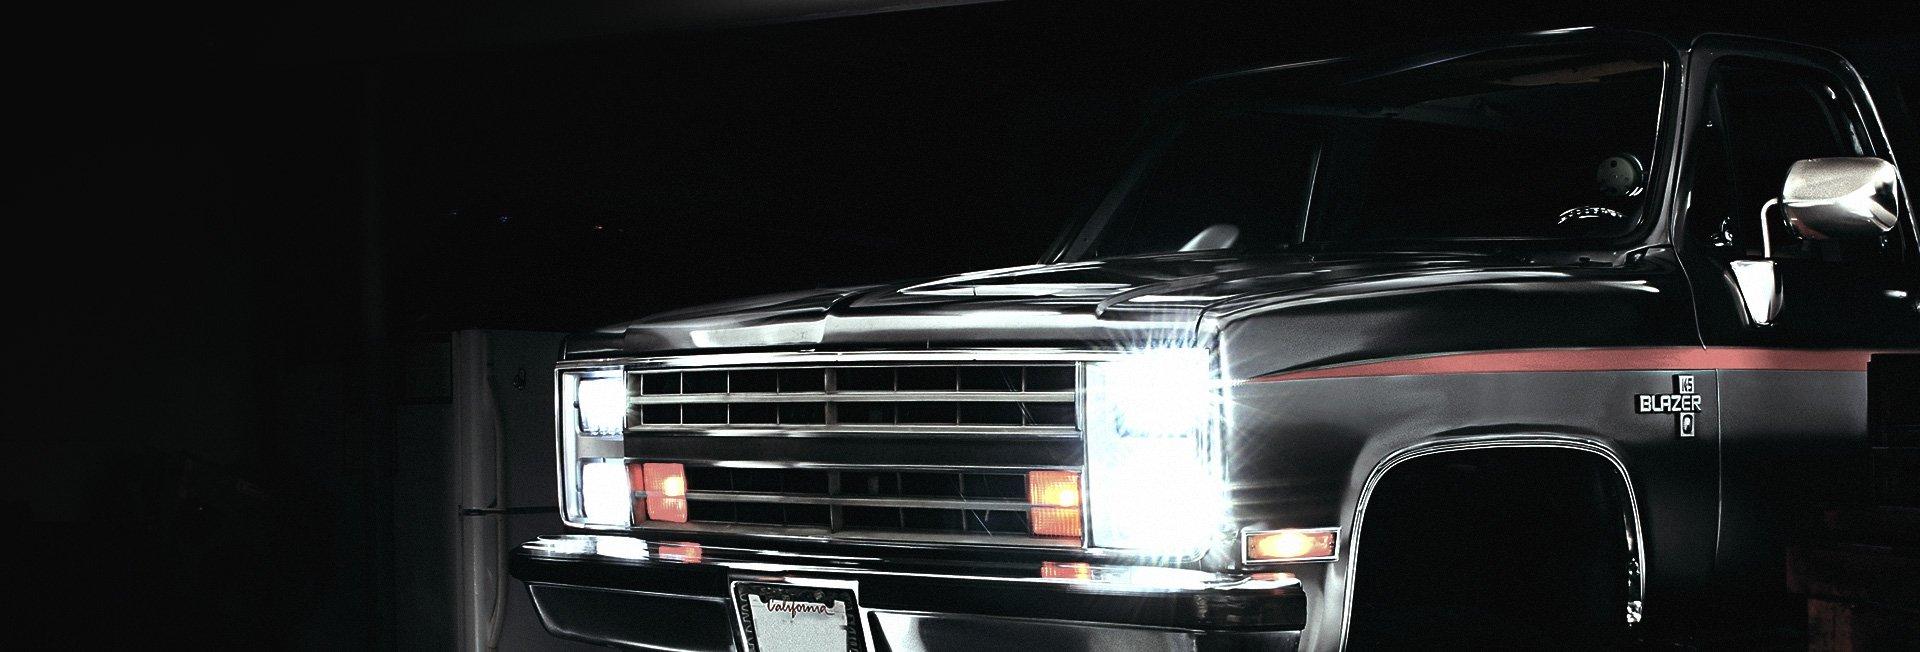 Cars & SUVs